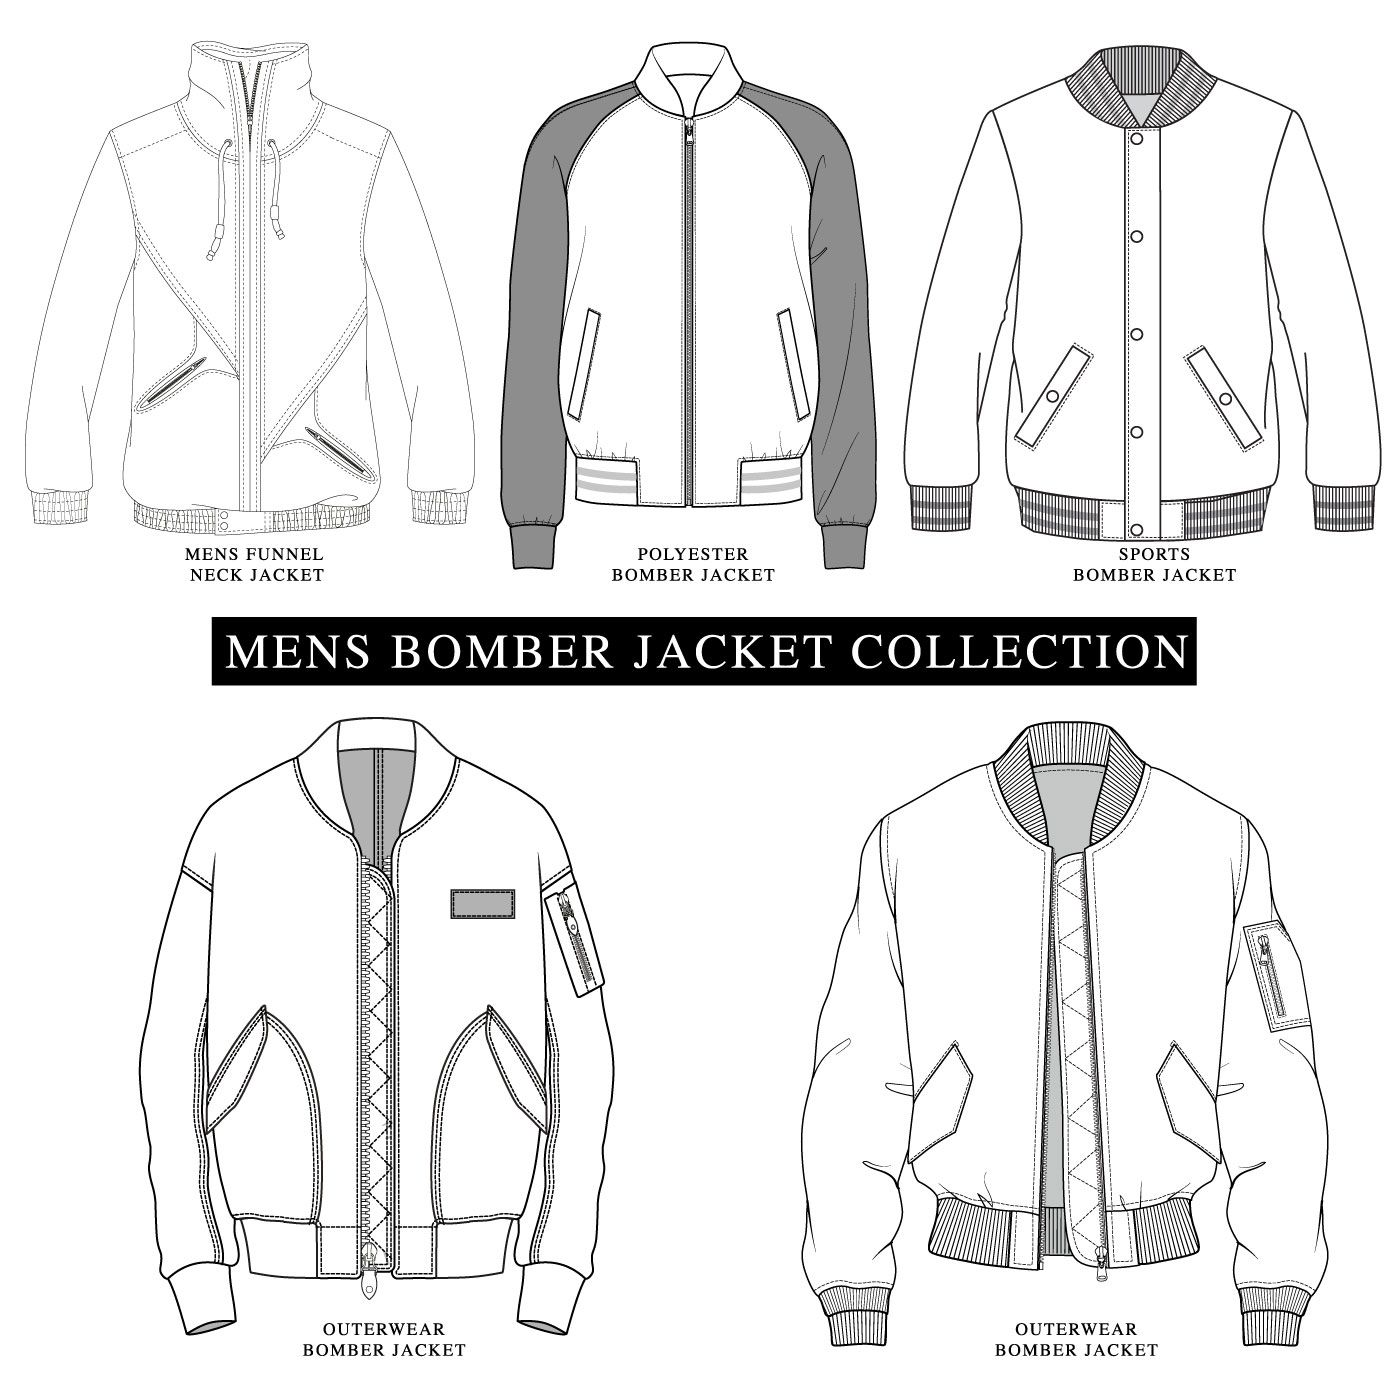 Bomber Jacket Collection Patterned Bomber Jacket Mens Jacket Pattern Jacket Drawing [ 1400 x 1400 Pixel ]